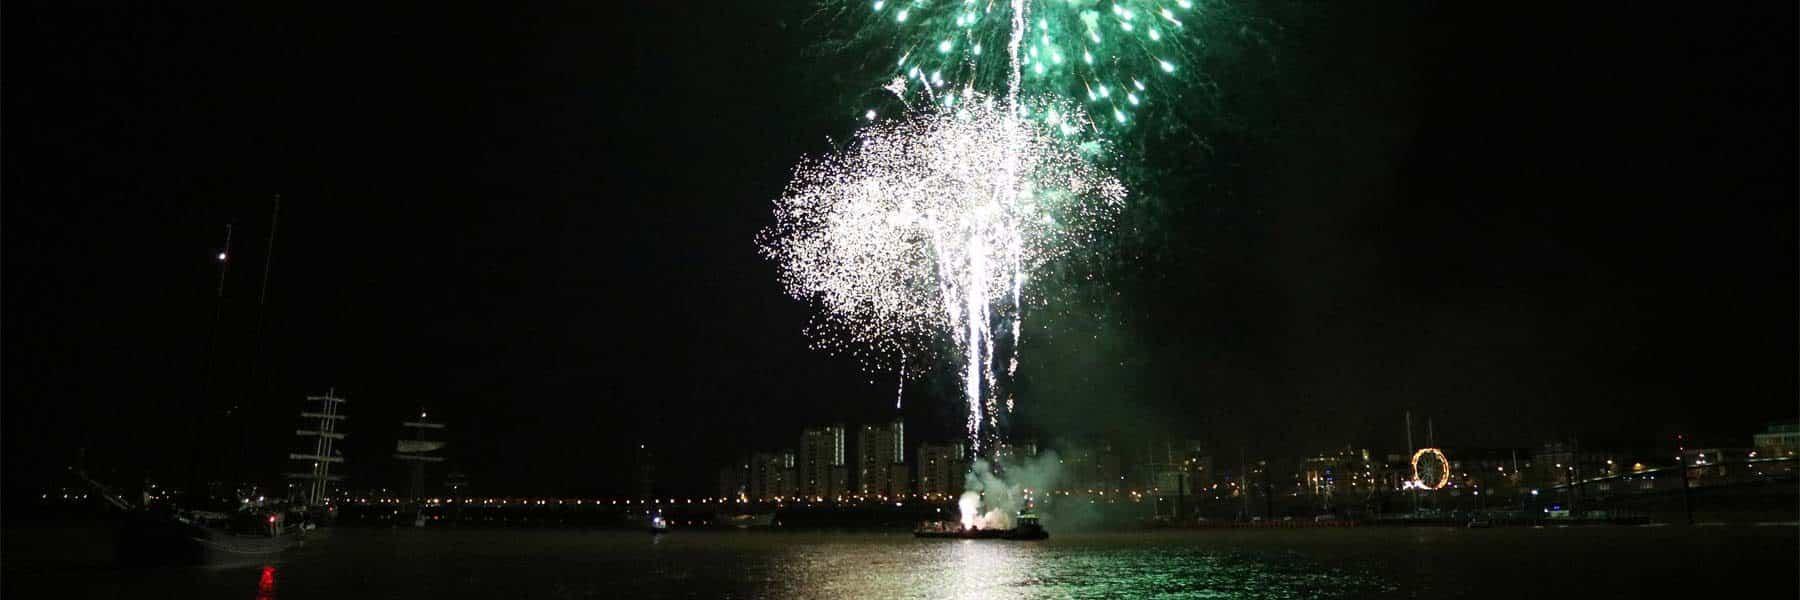 Tall Ships Fireworks Display